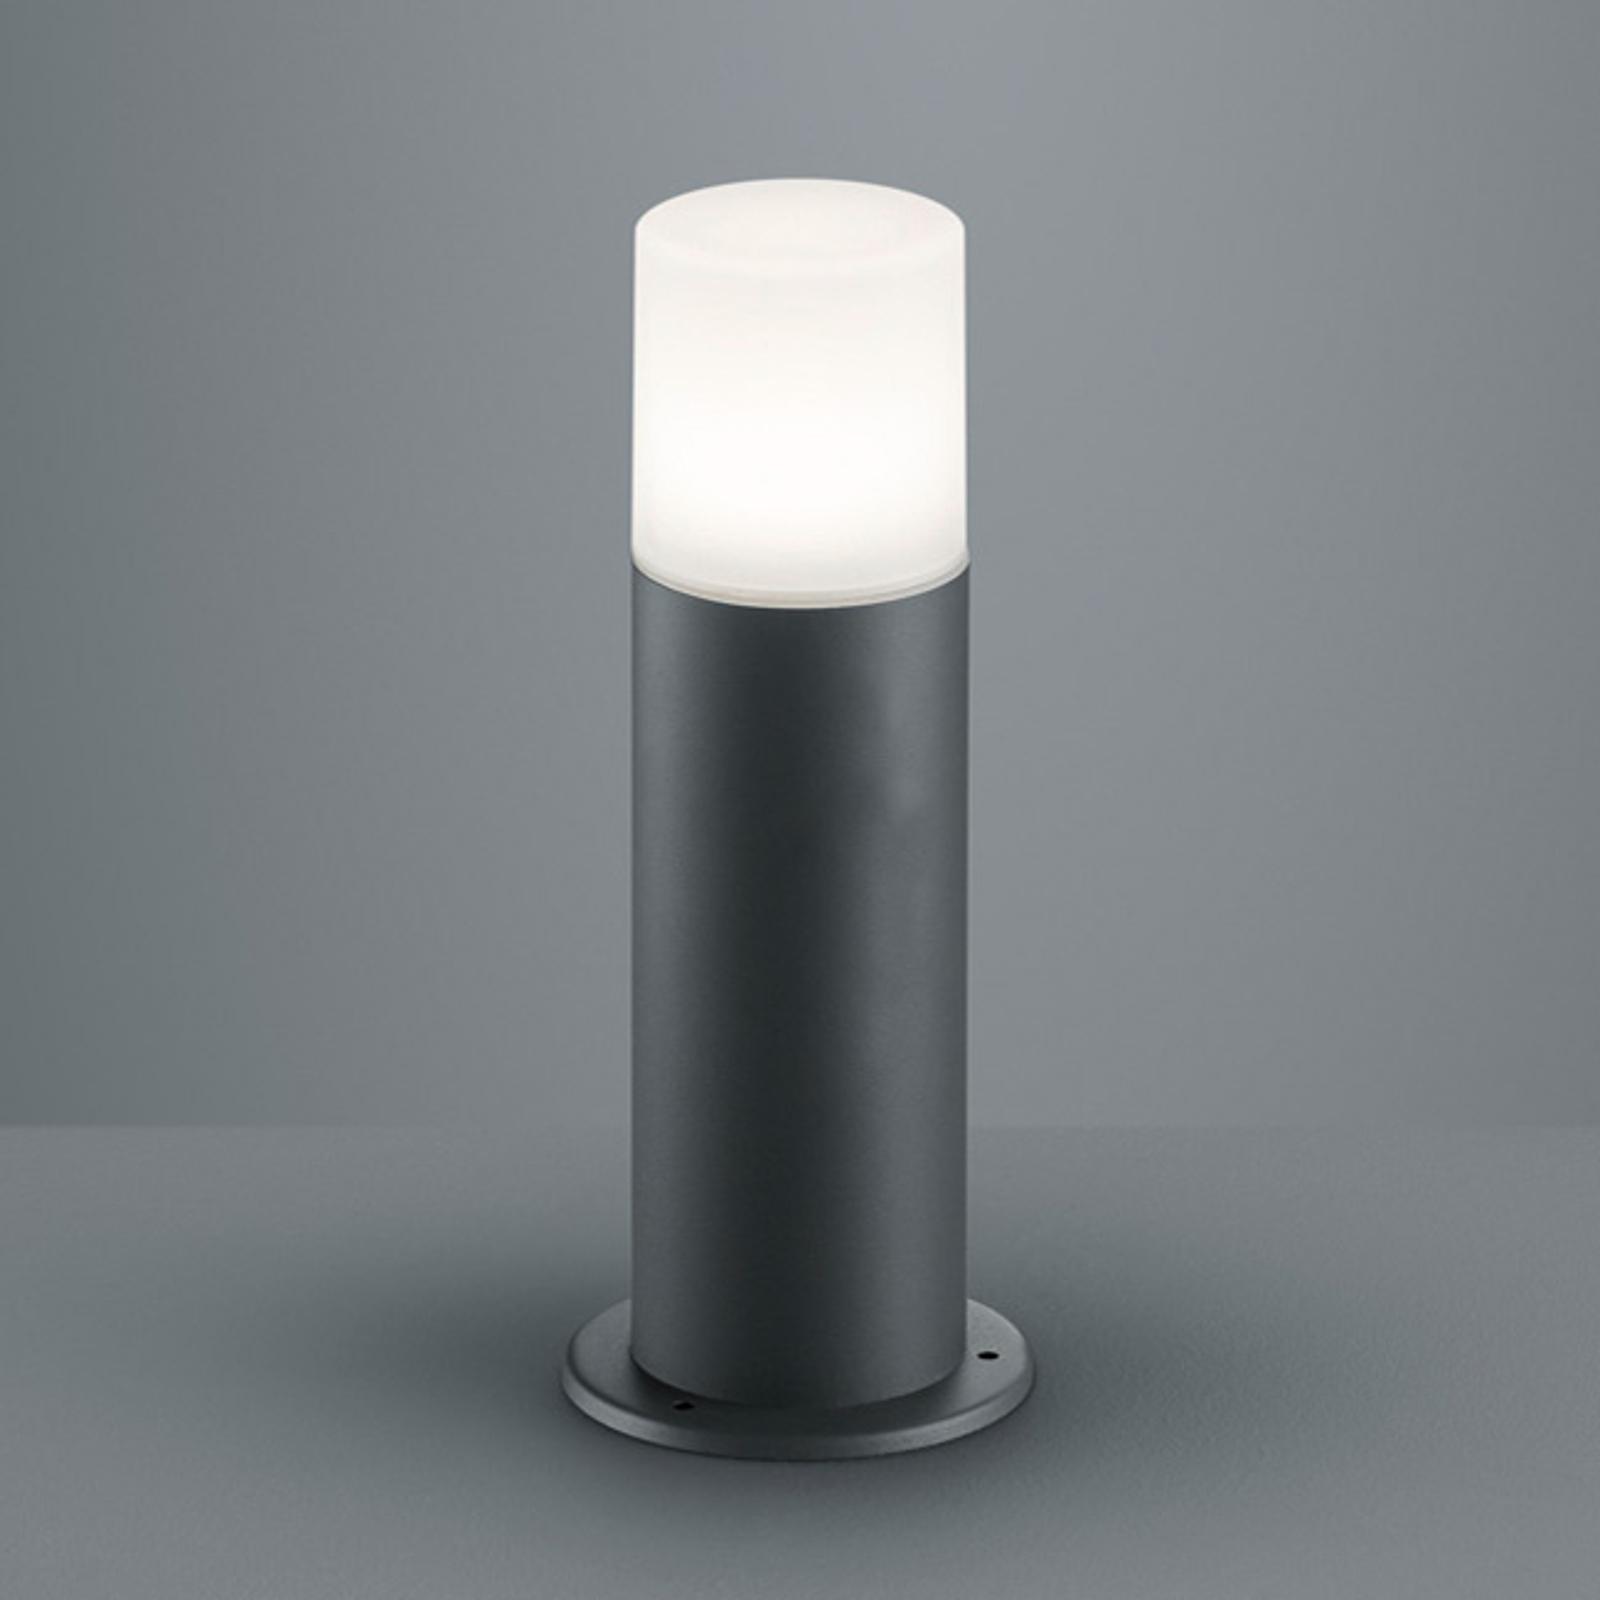 Lampa cokołowa Hoosic z aluminium, antracyt